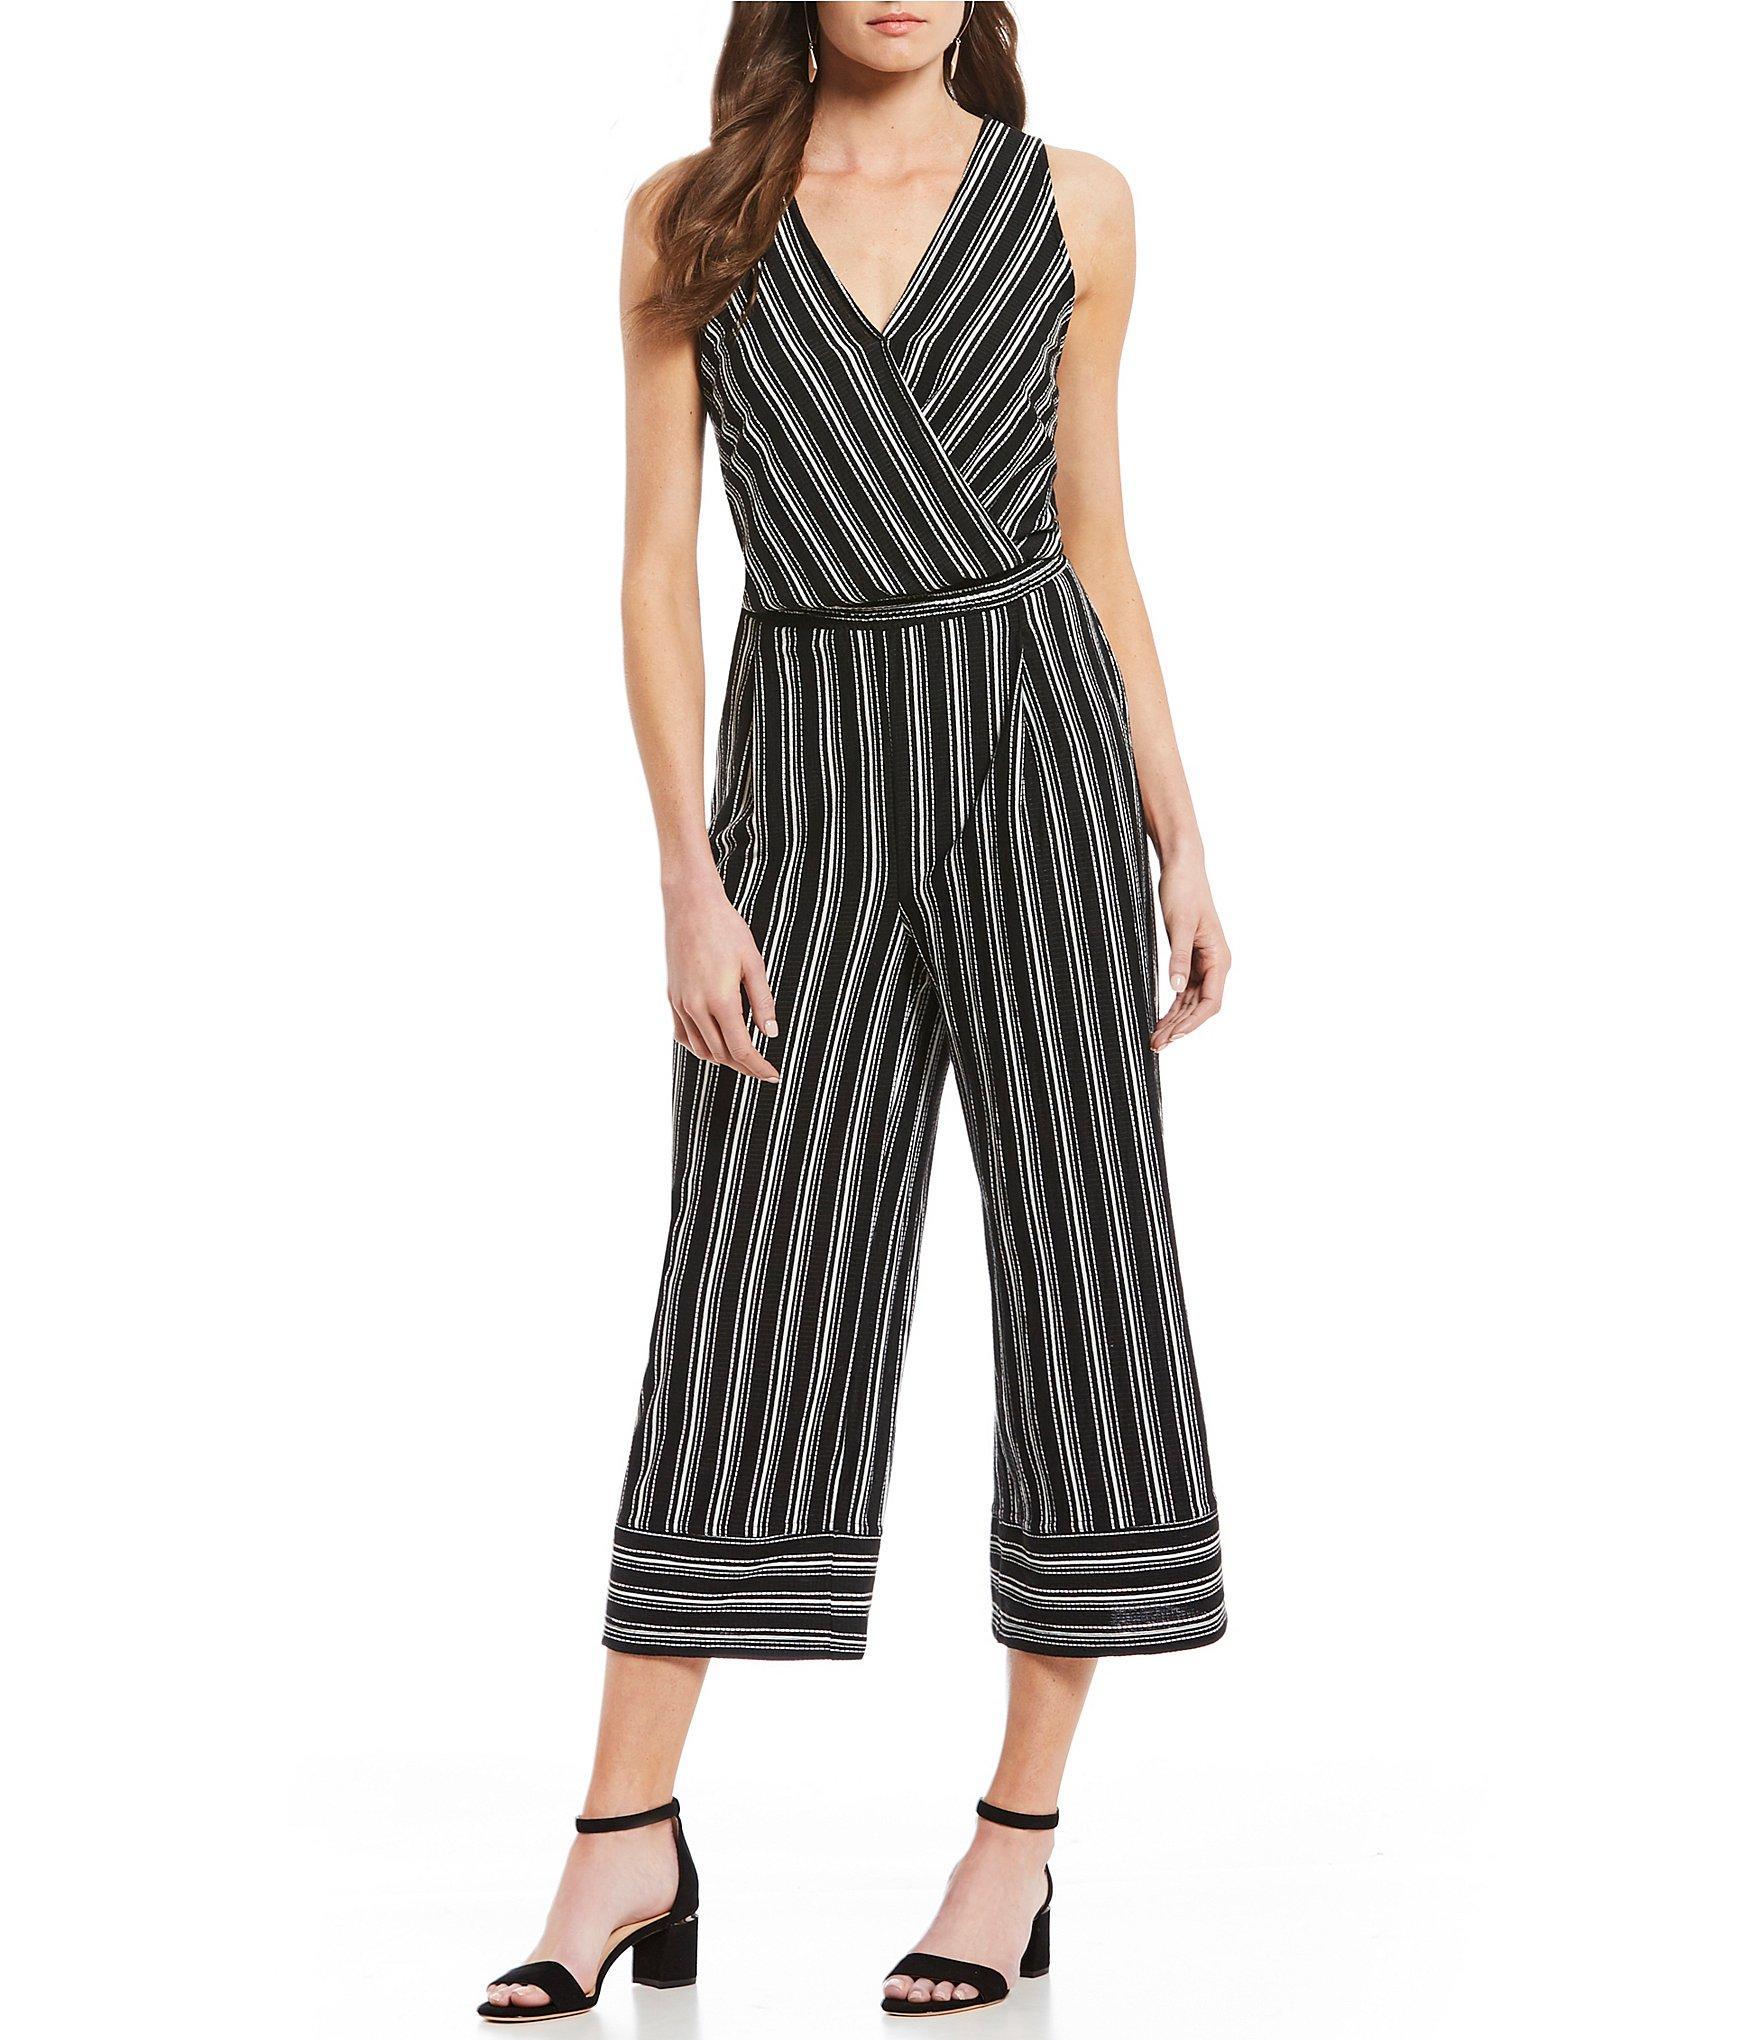 d75e55fdb542 Democracy. Women s Black Striped Surplice V-neck Sleeveless Cropped Jumpsuit